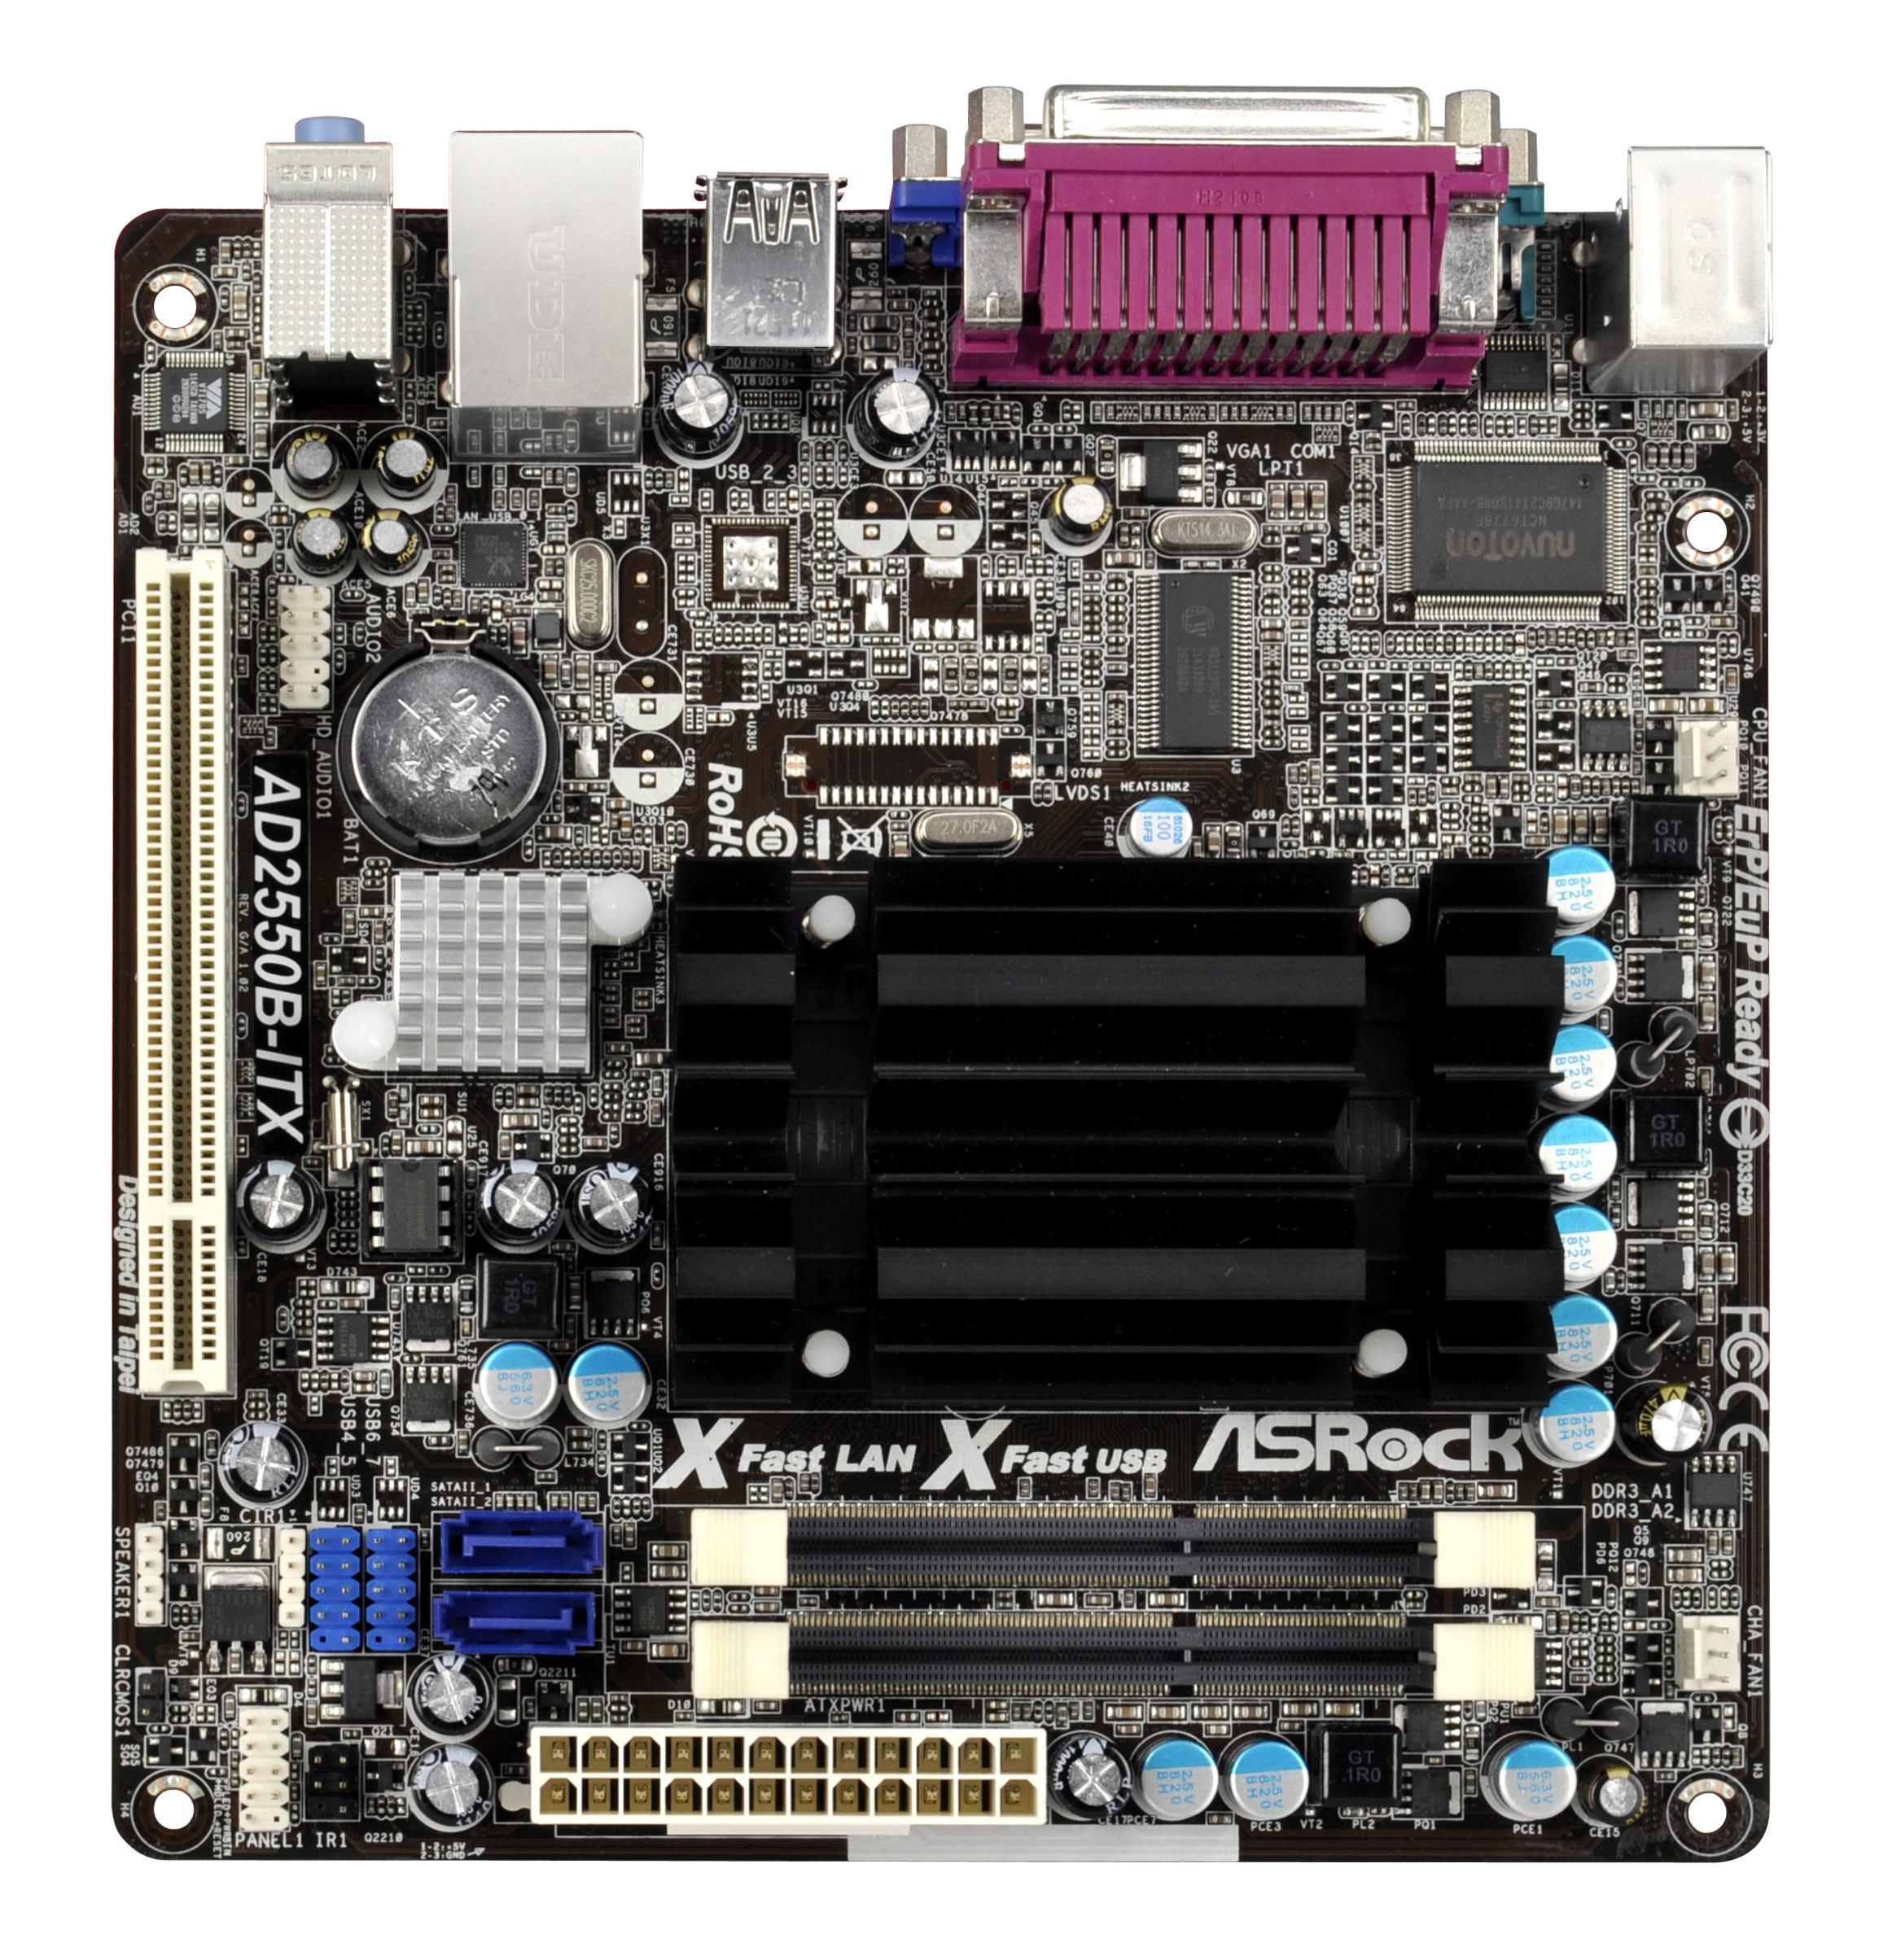 ASROCK AD2550-ITX XFAST RAM DRIVER DOWNLOAD